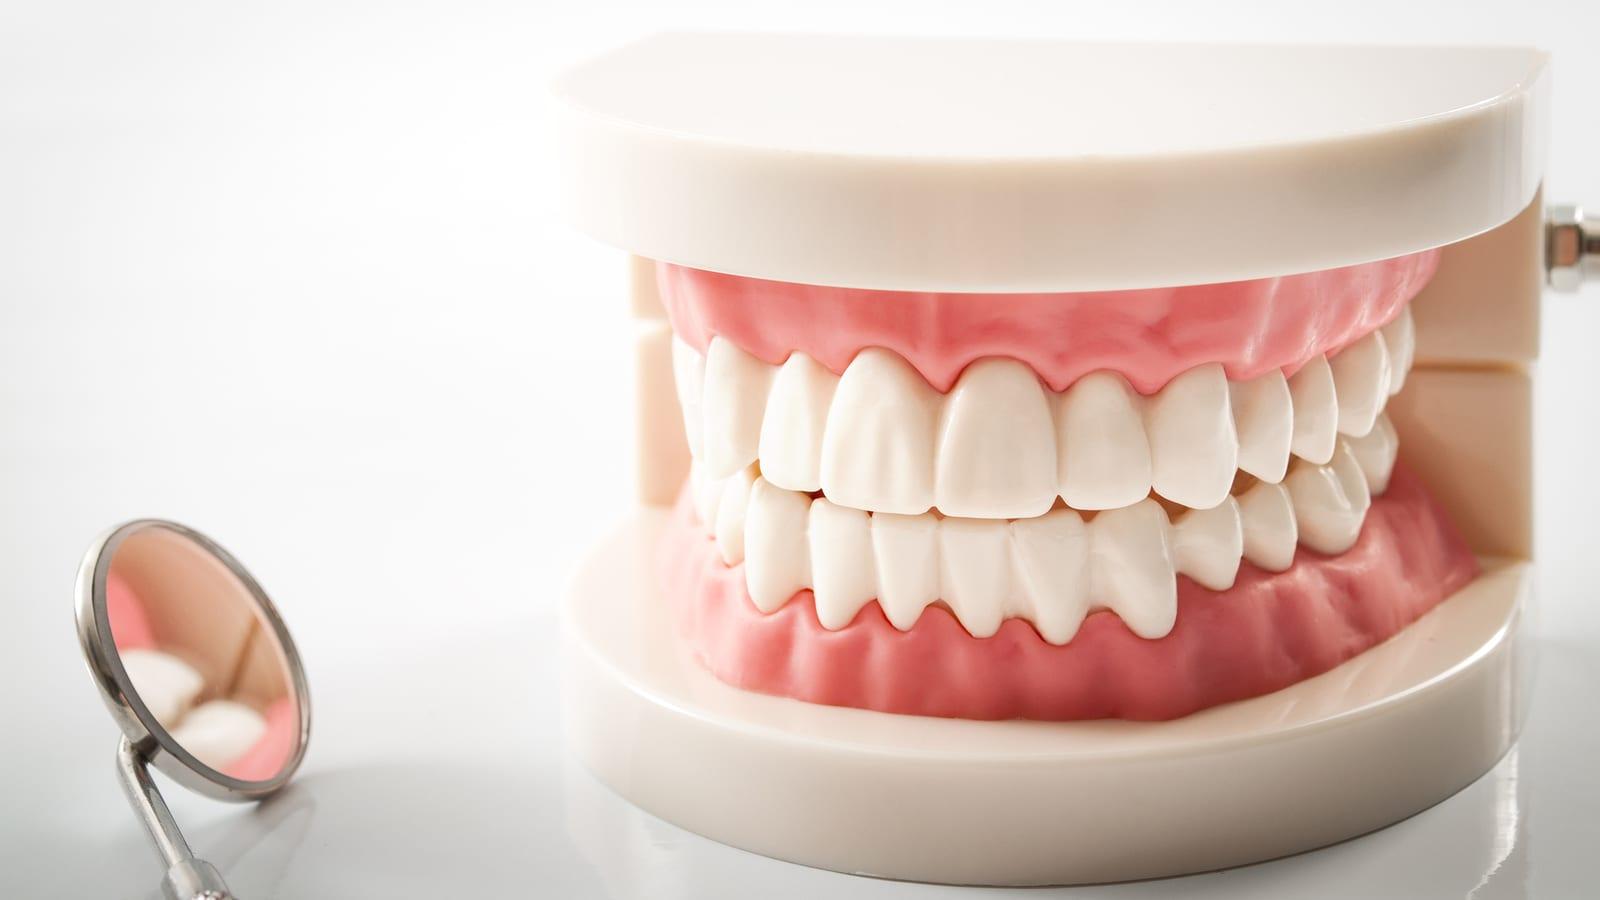 Image of Dentures